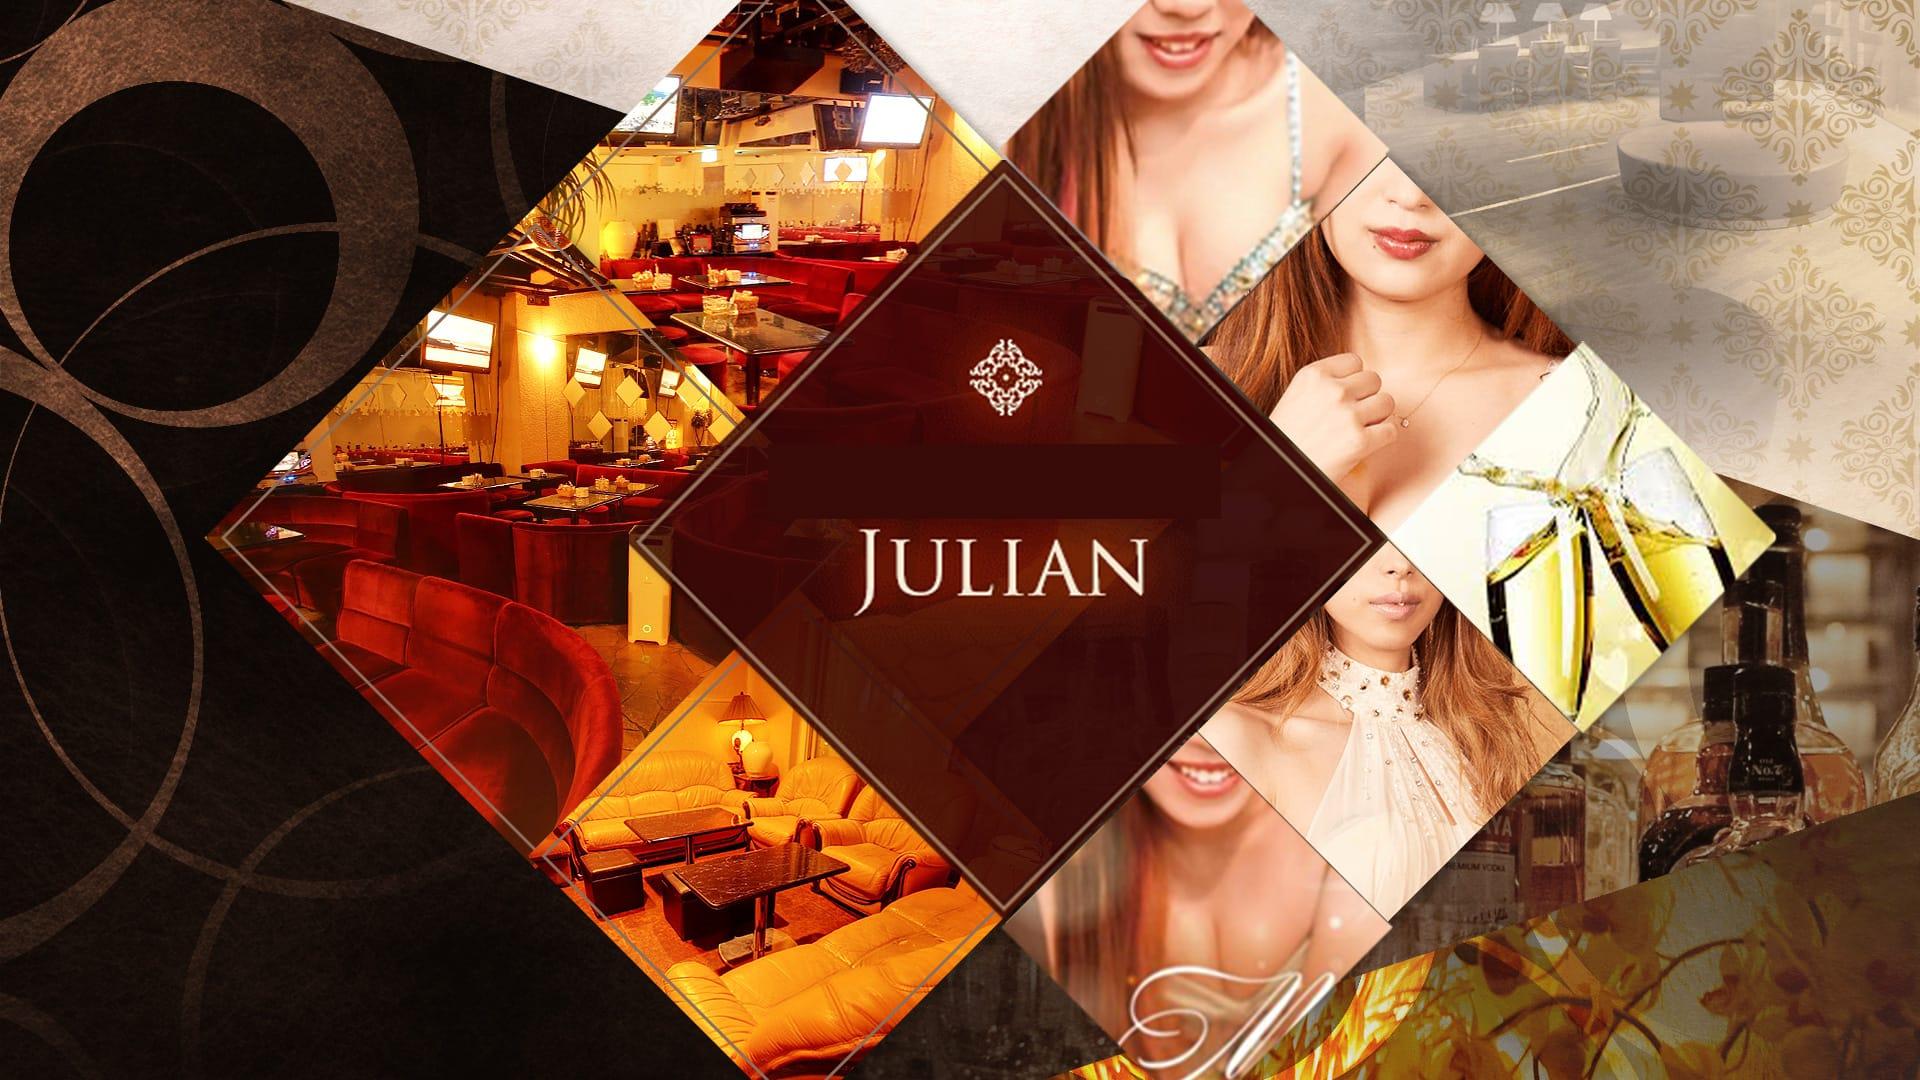 Julian(ジュリアン) 山形キャバクラ TOP画像